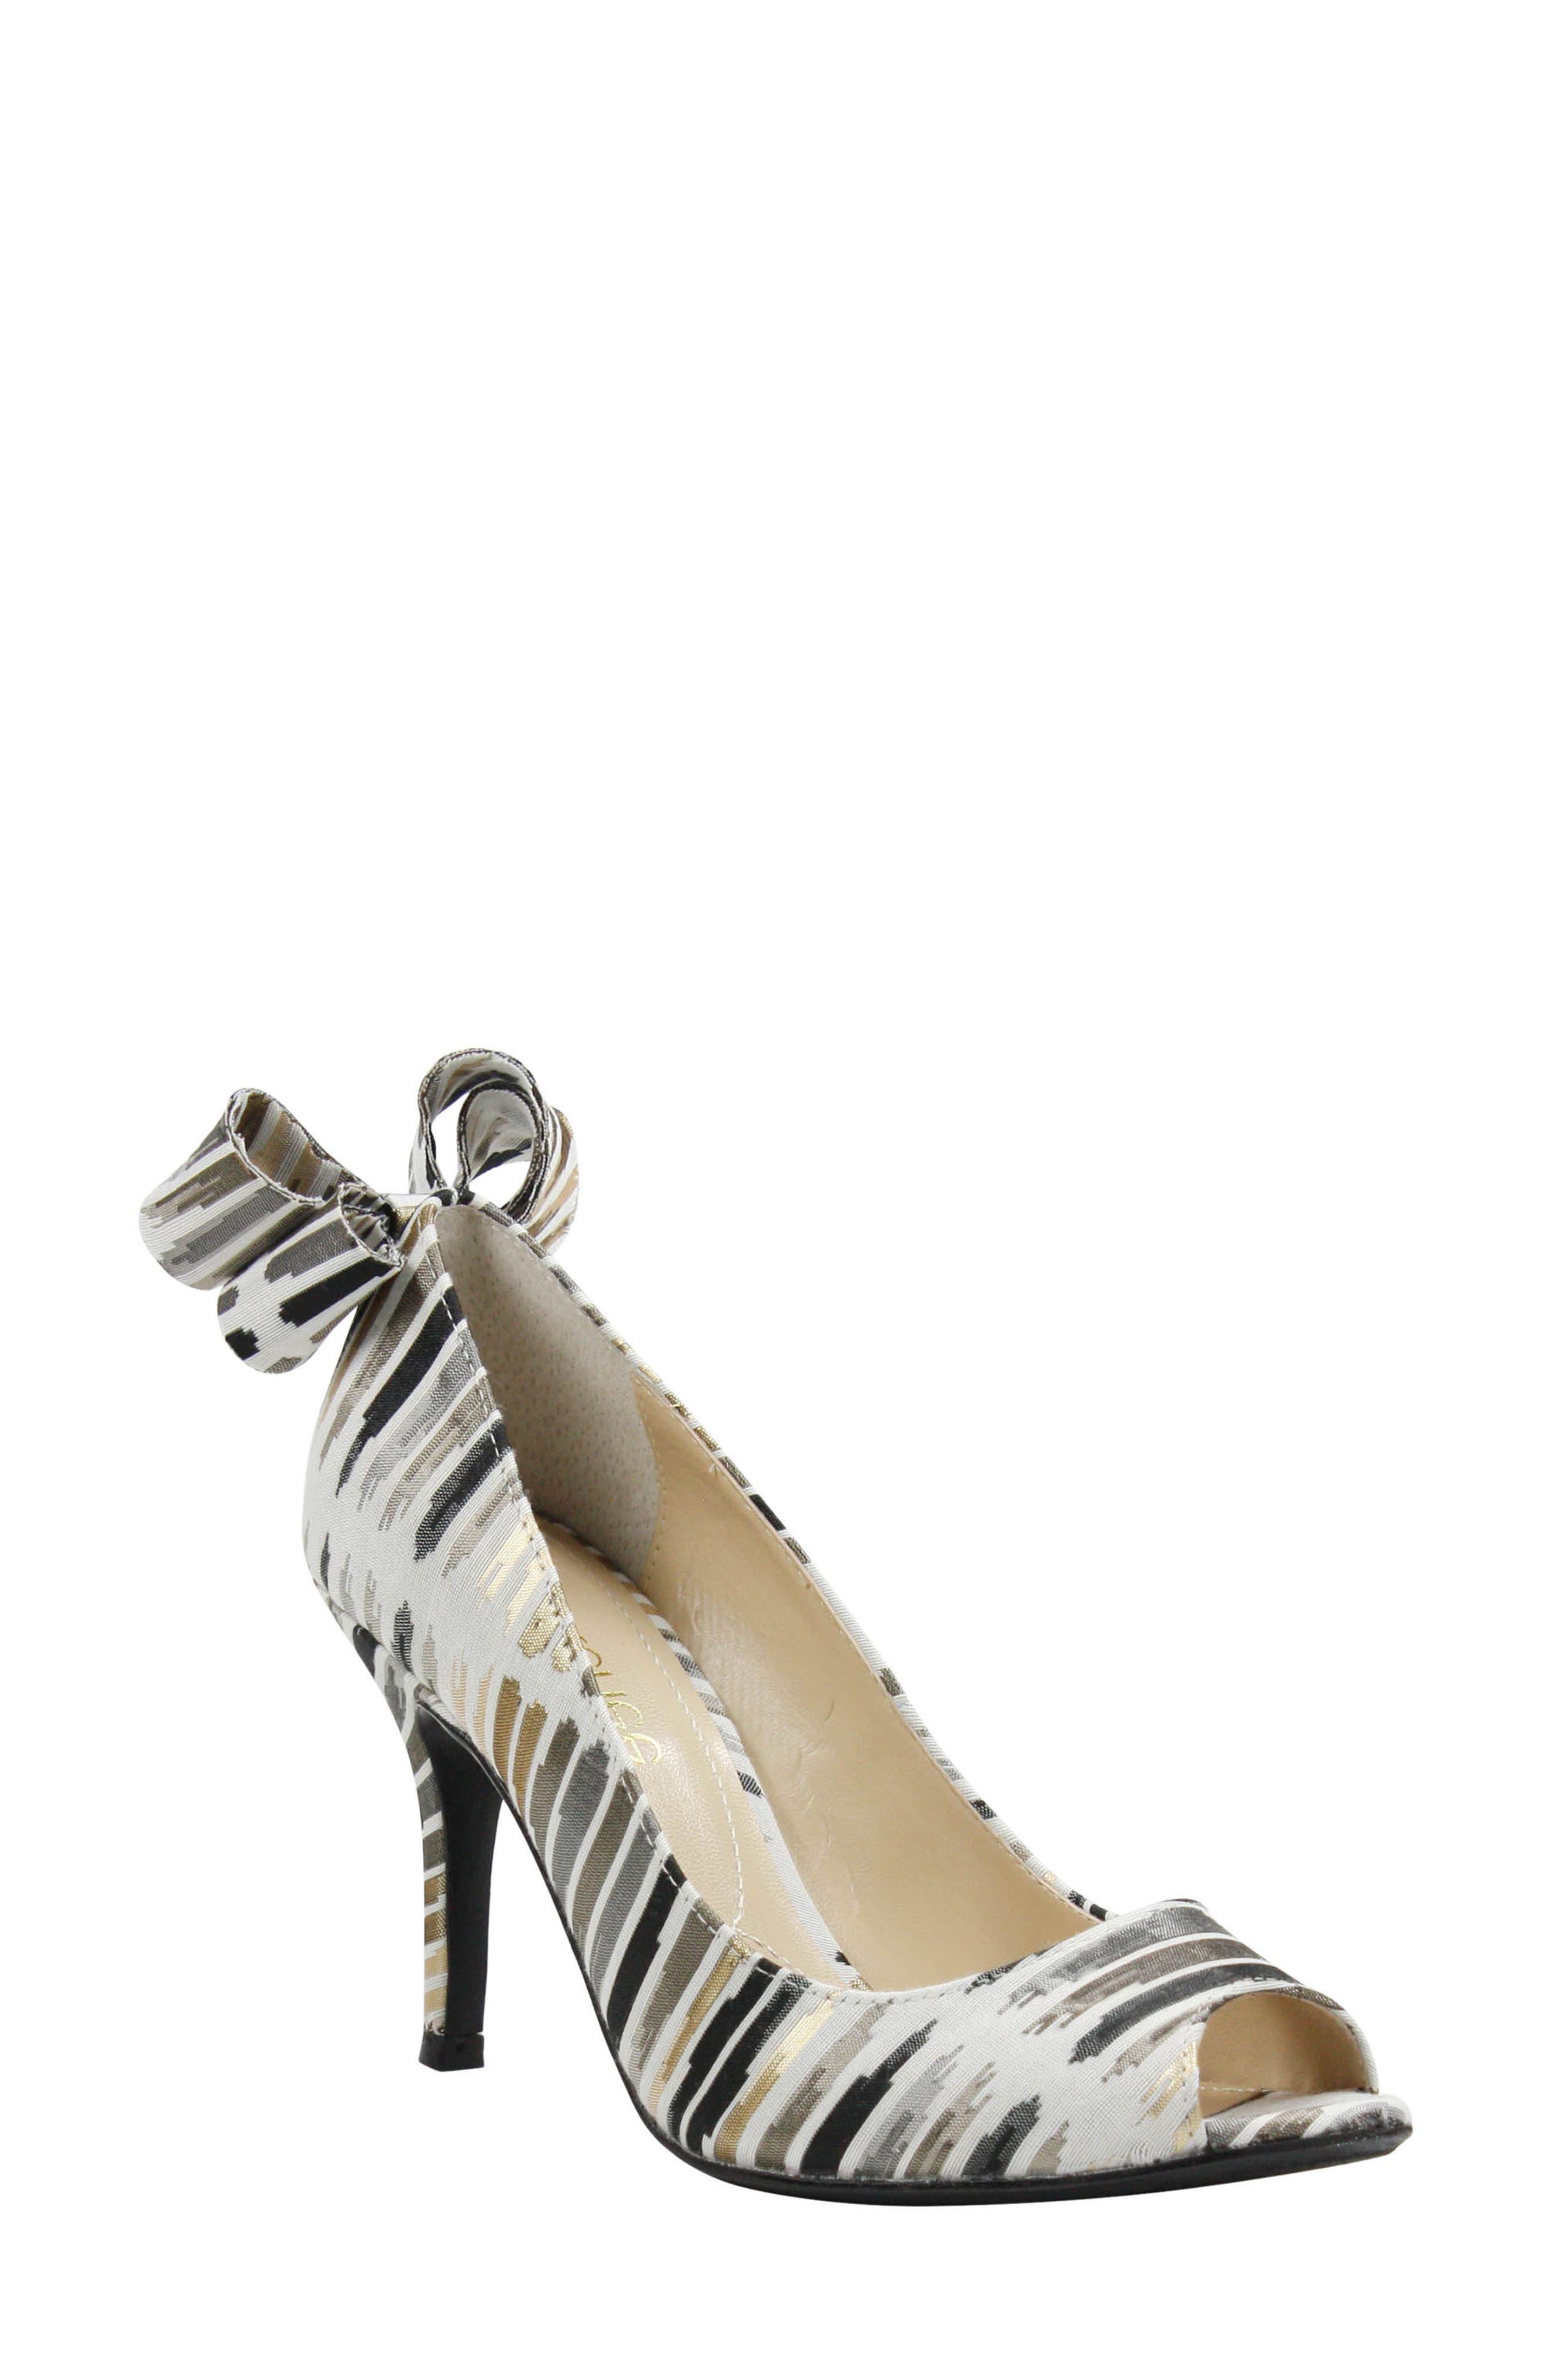 Ellasee Bow Peep Toe Pump,                         Main,                         color, Cream/ Black/ Gold Fabric